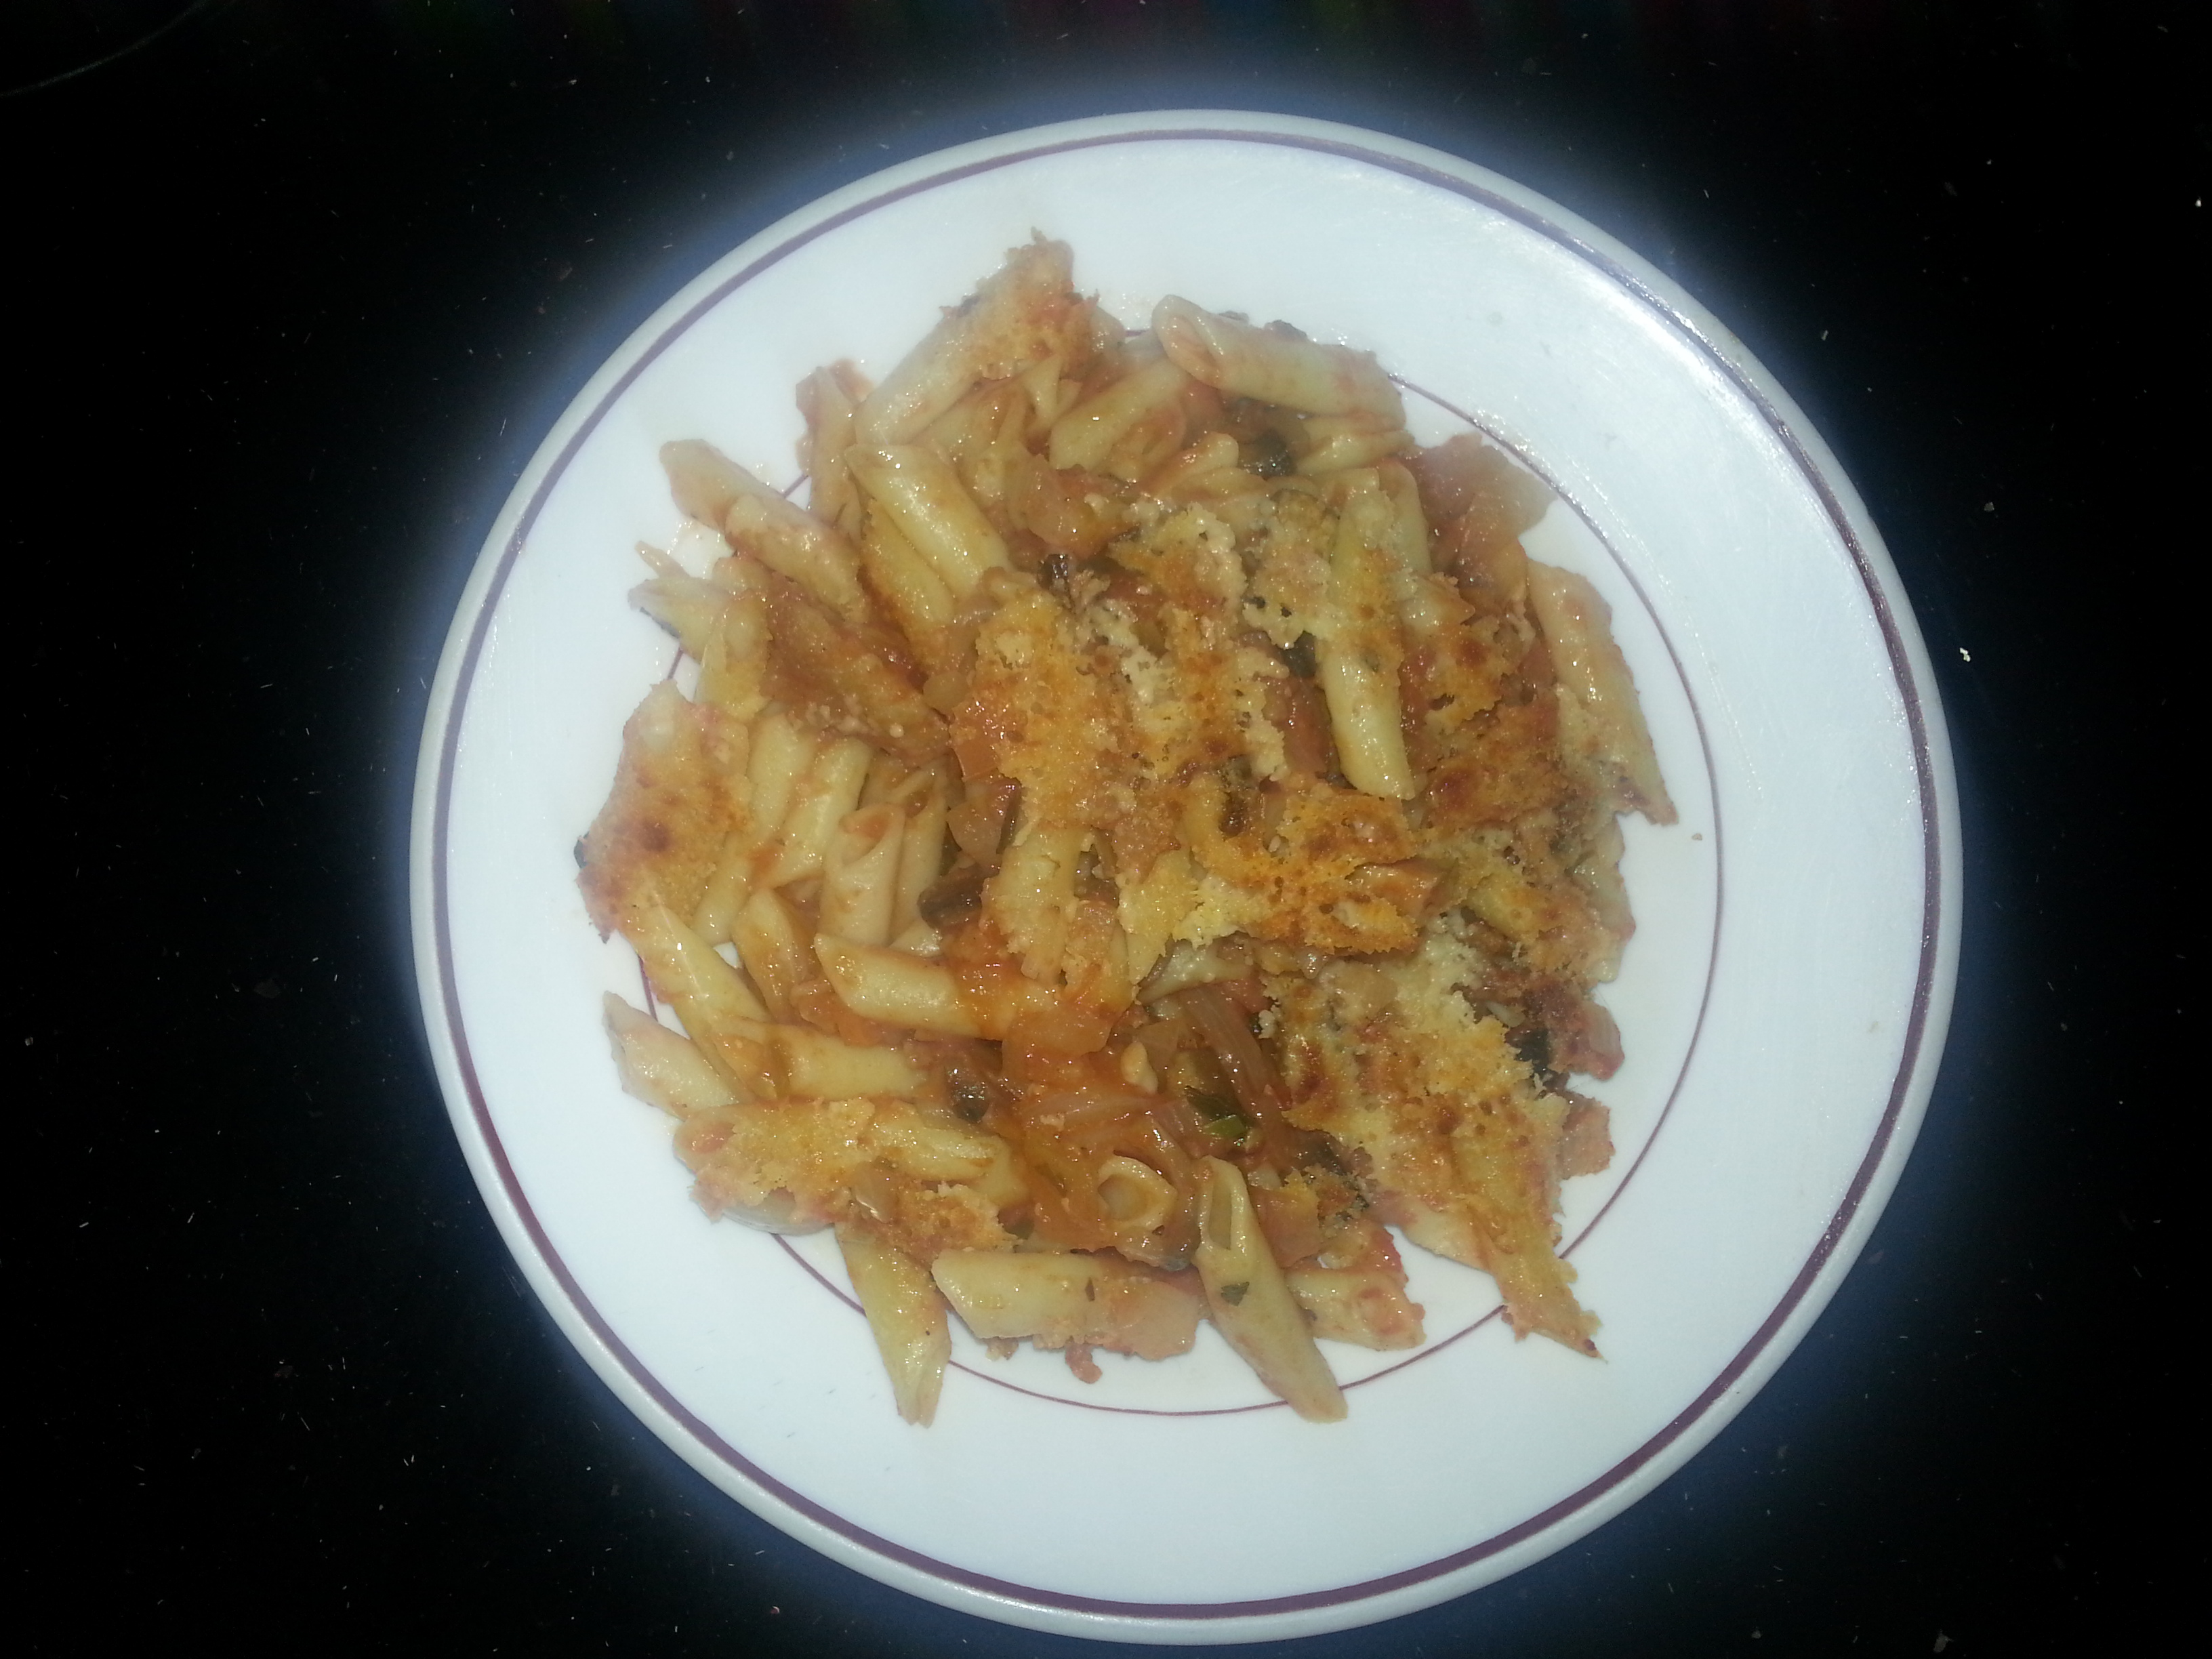 Macarrones con verduras al horno cocina f cil y barato - Macarrones con verduras al horno ...